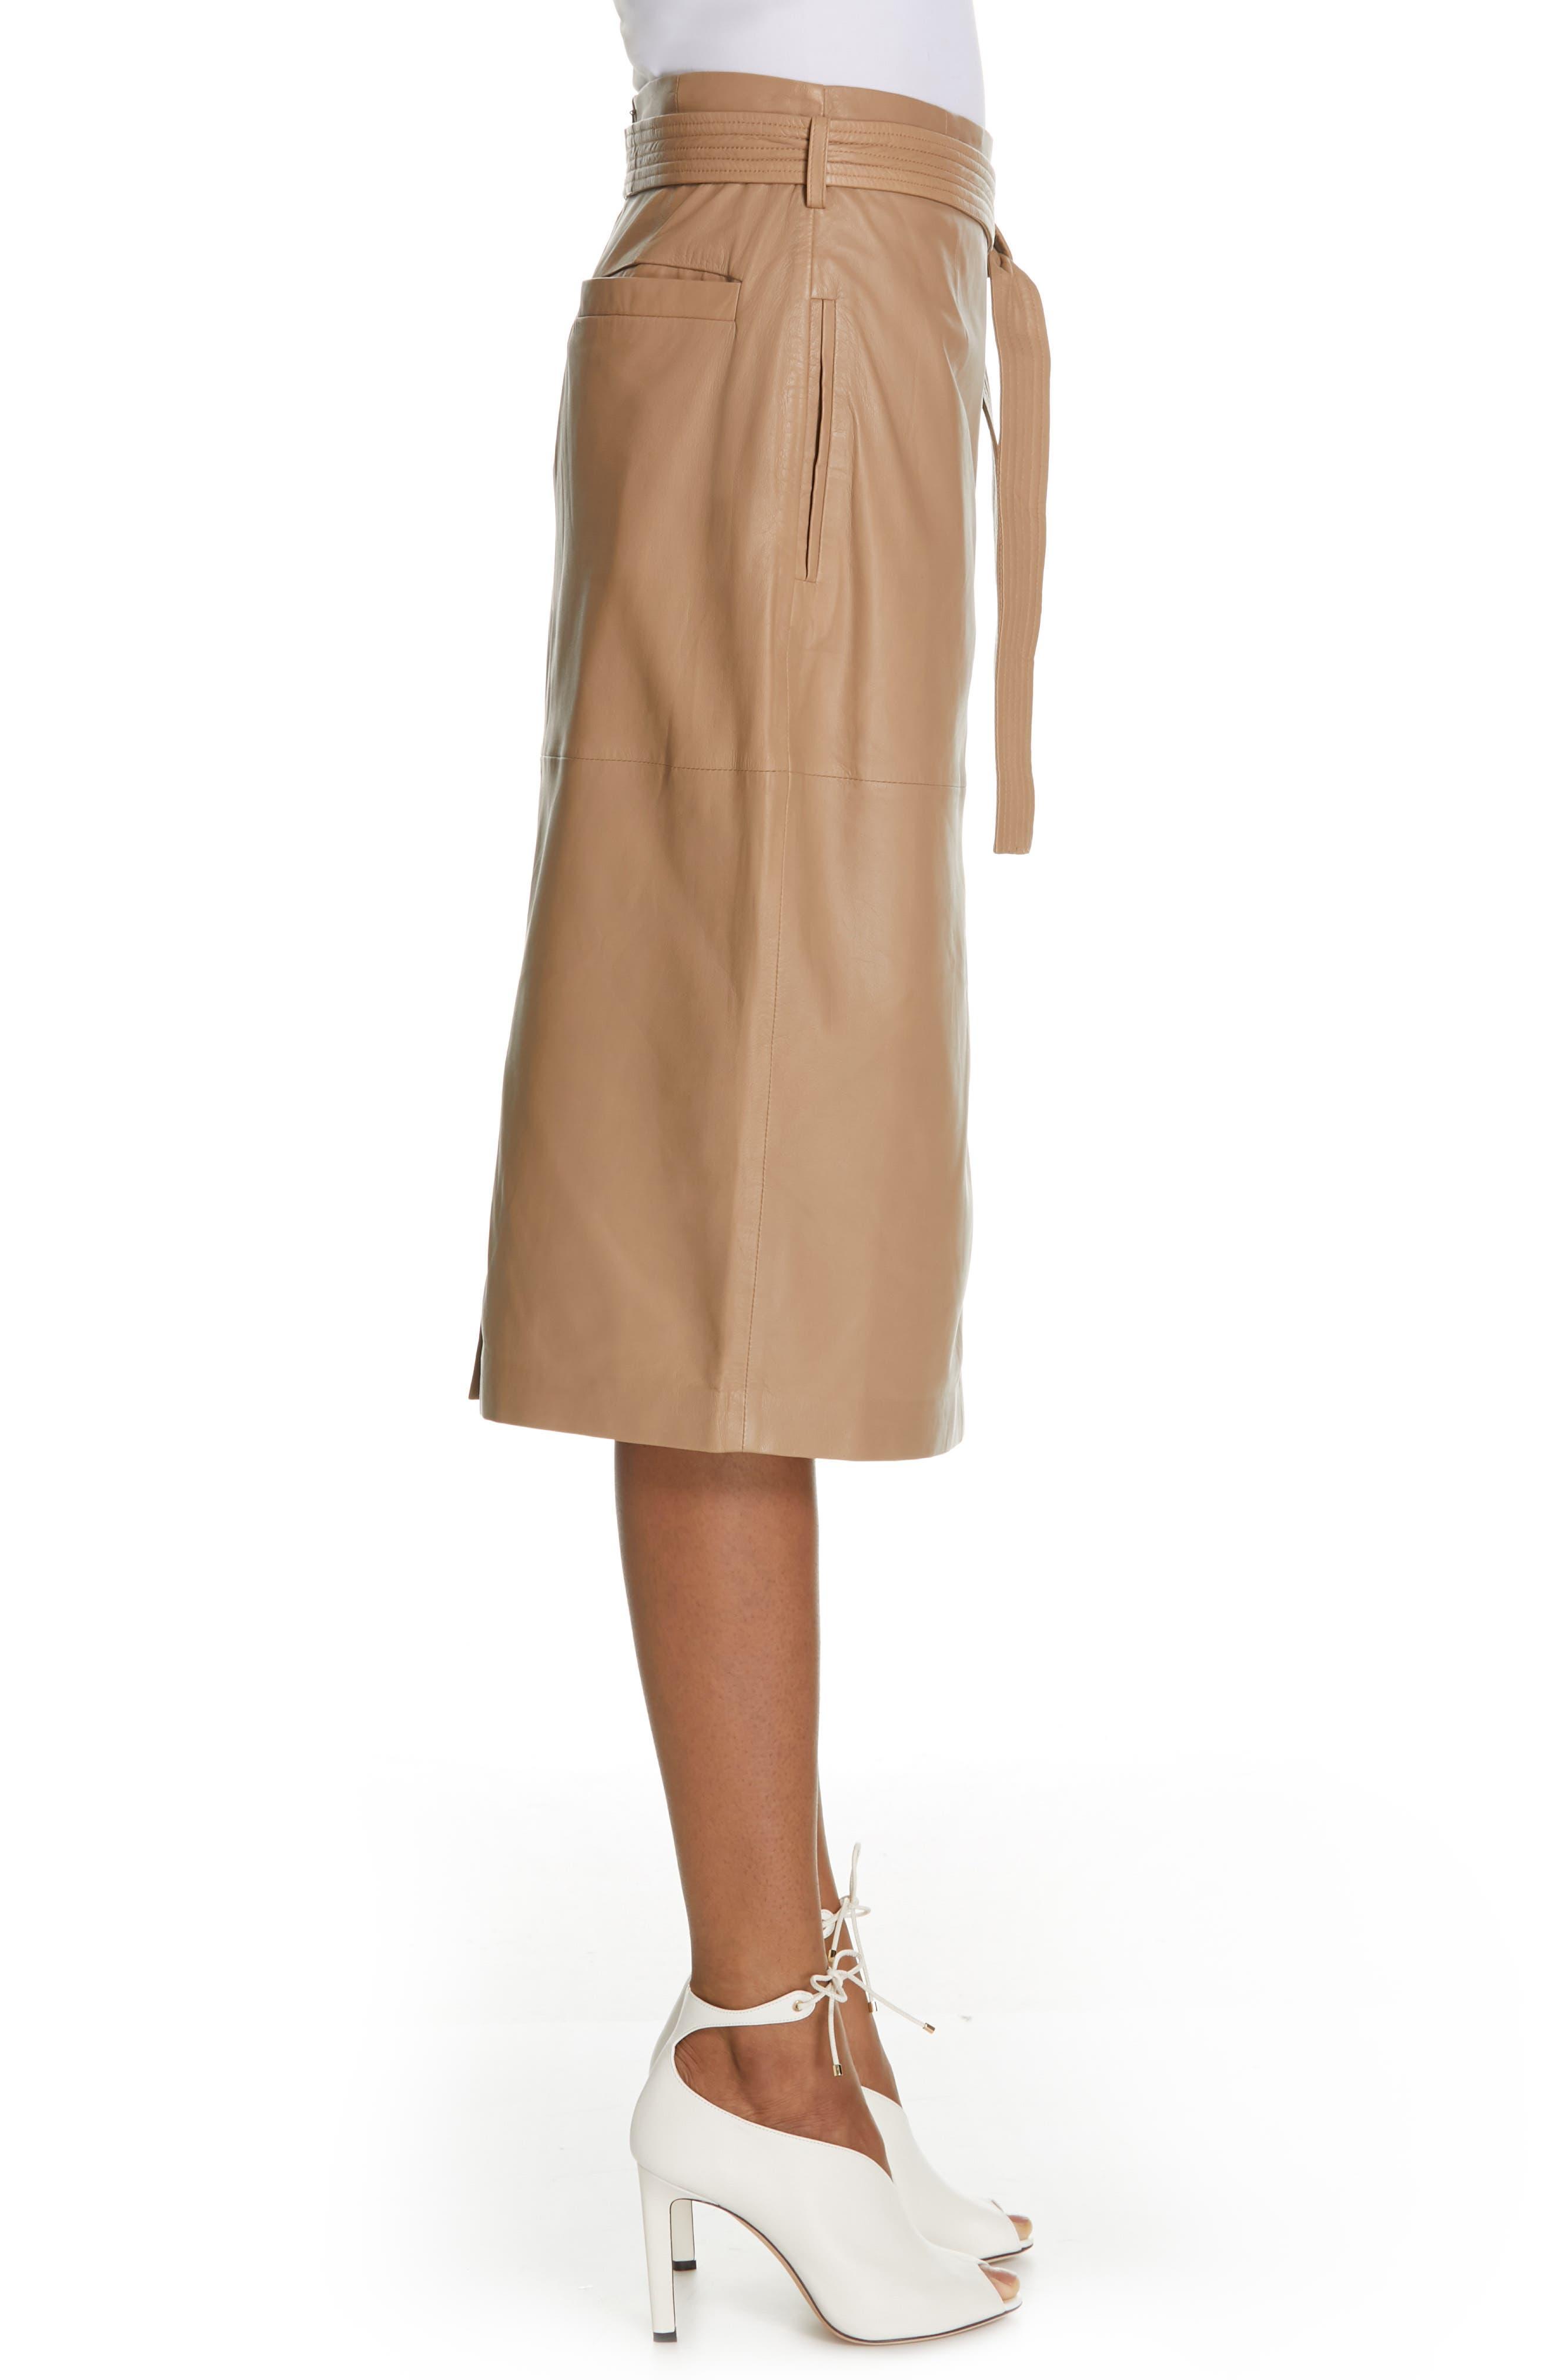 Alouetta Leather Skirt,                             Alternate thumbnail 3, color,                             BOIS